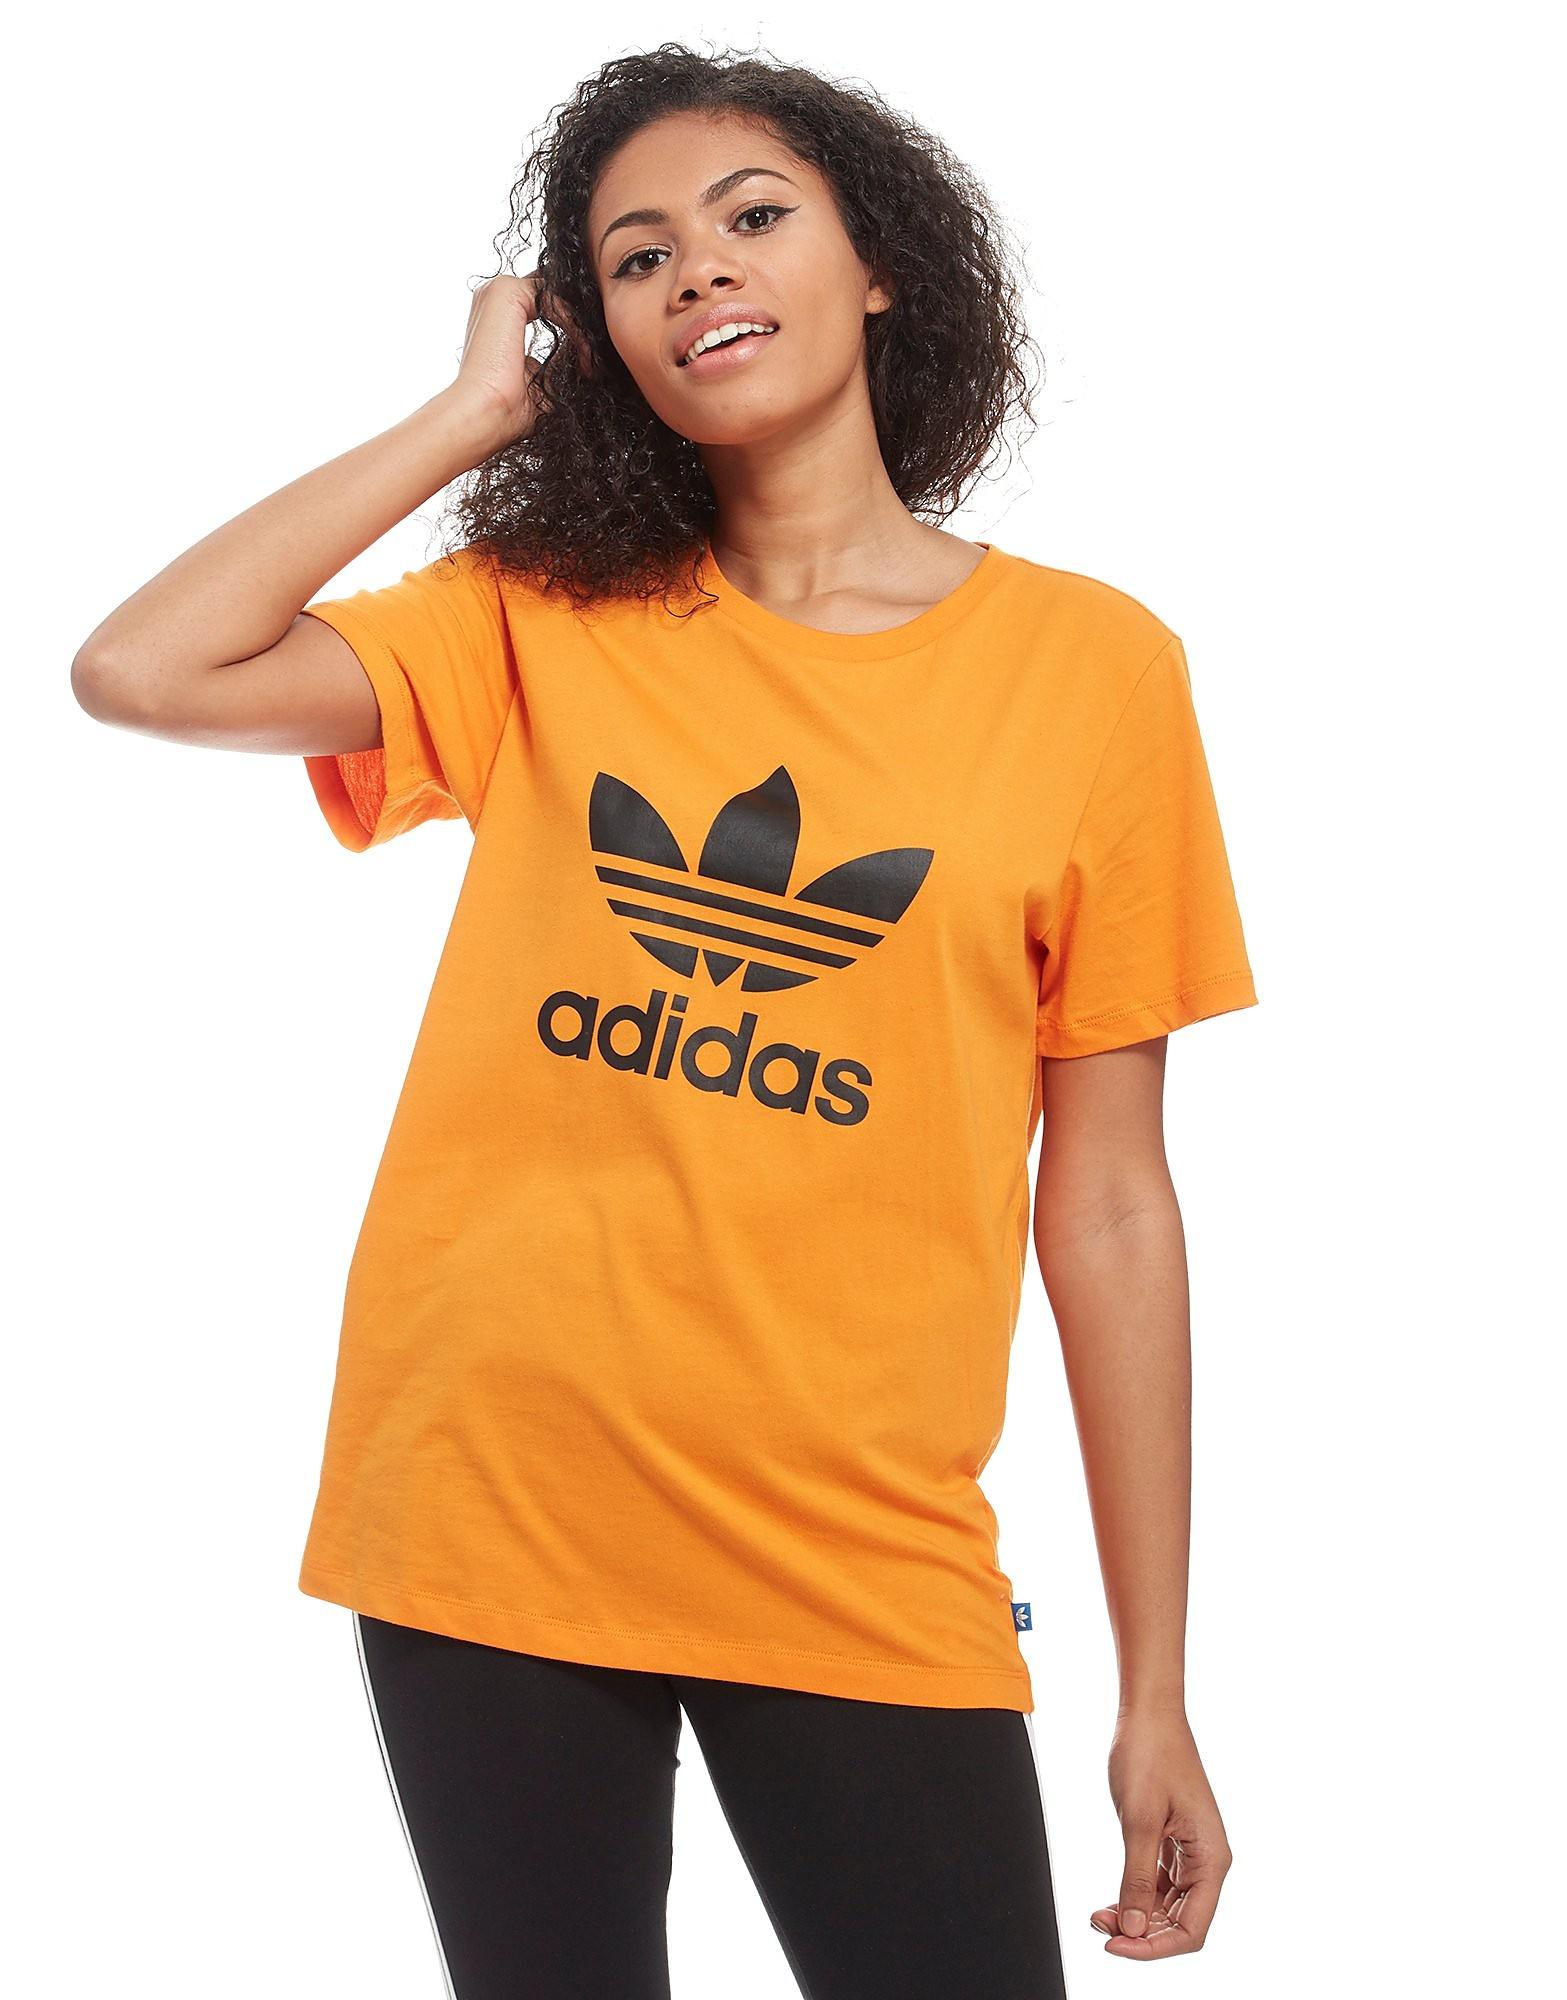 adidas Originals Trefoil Boyfriend T-Shirt